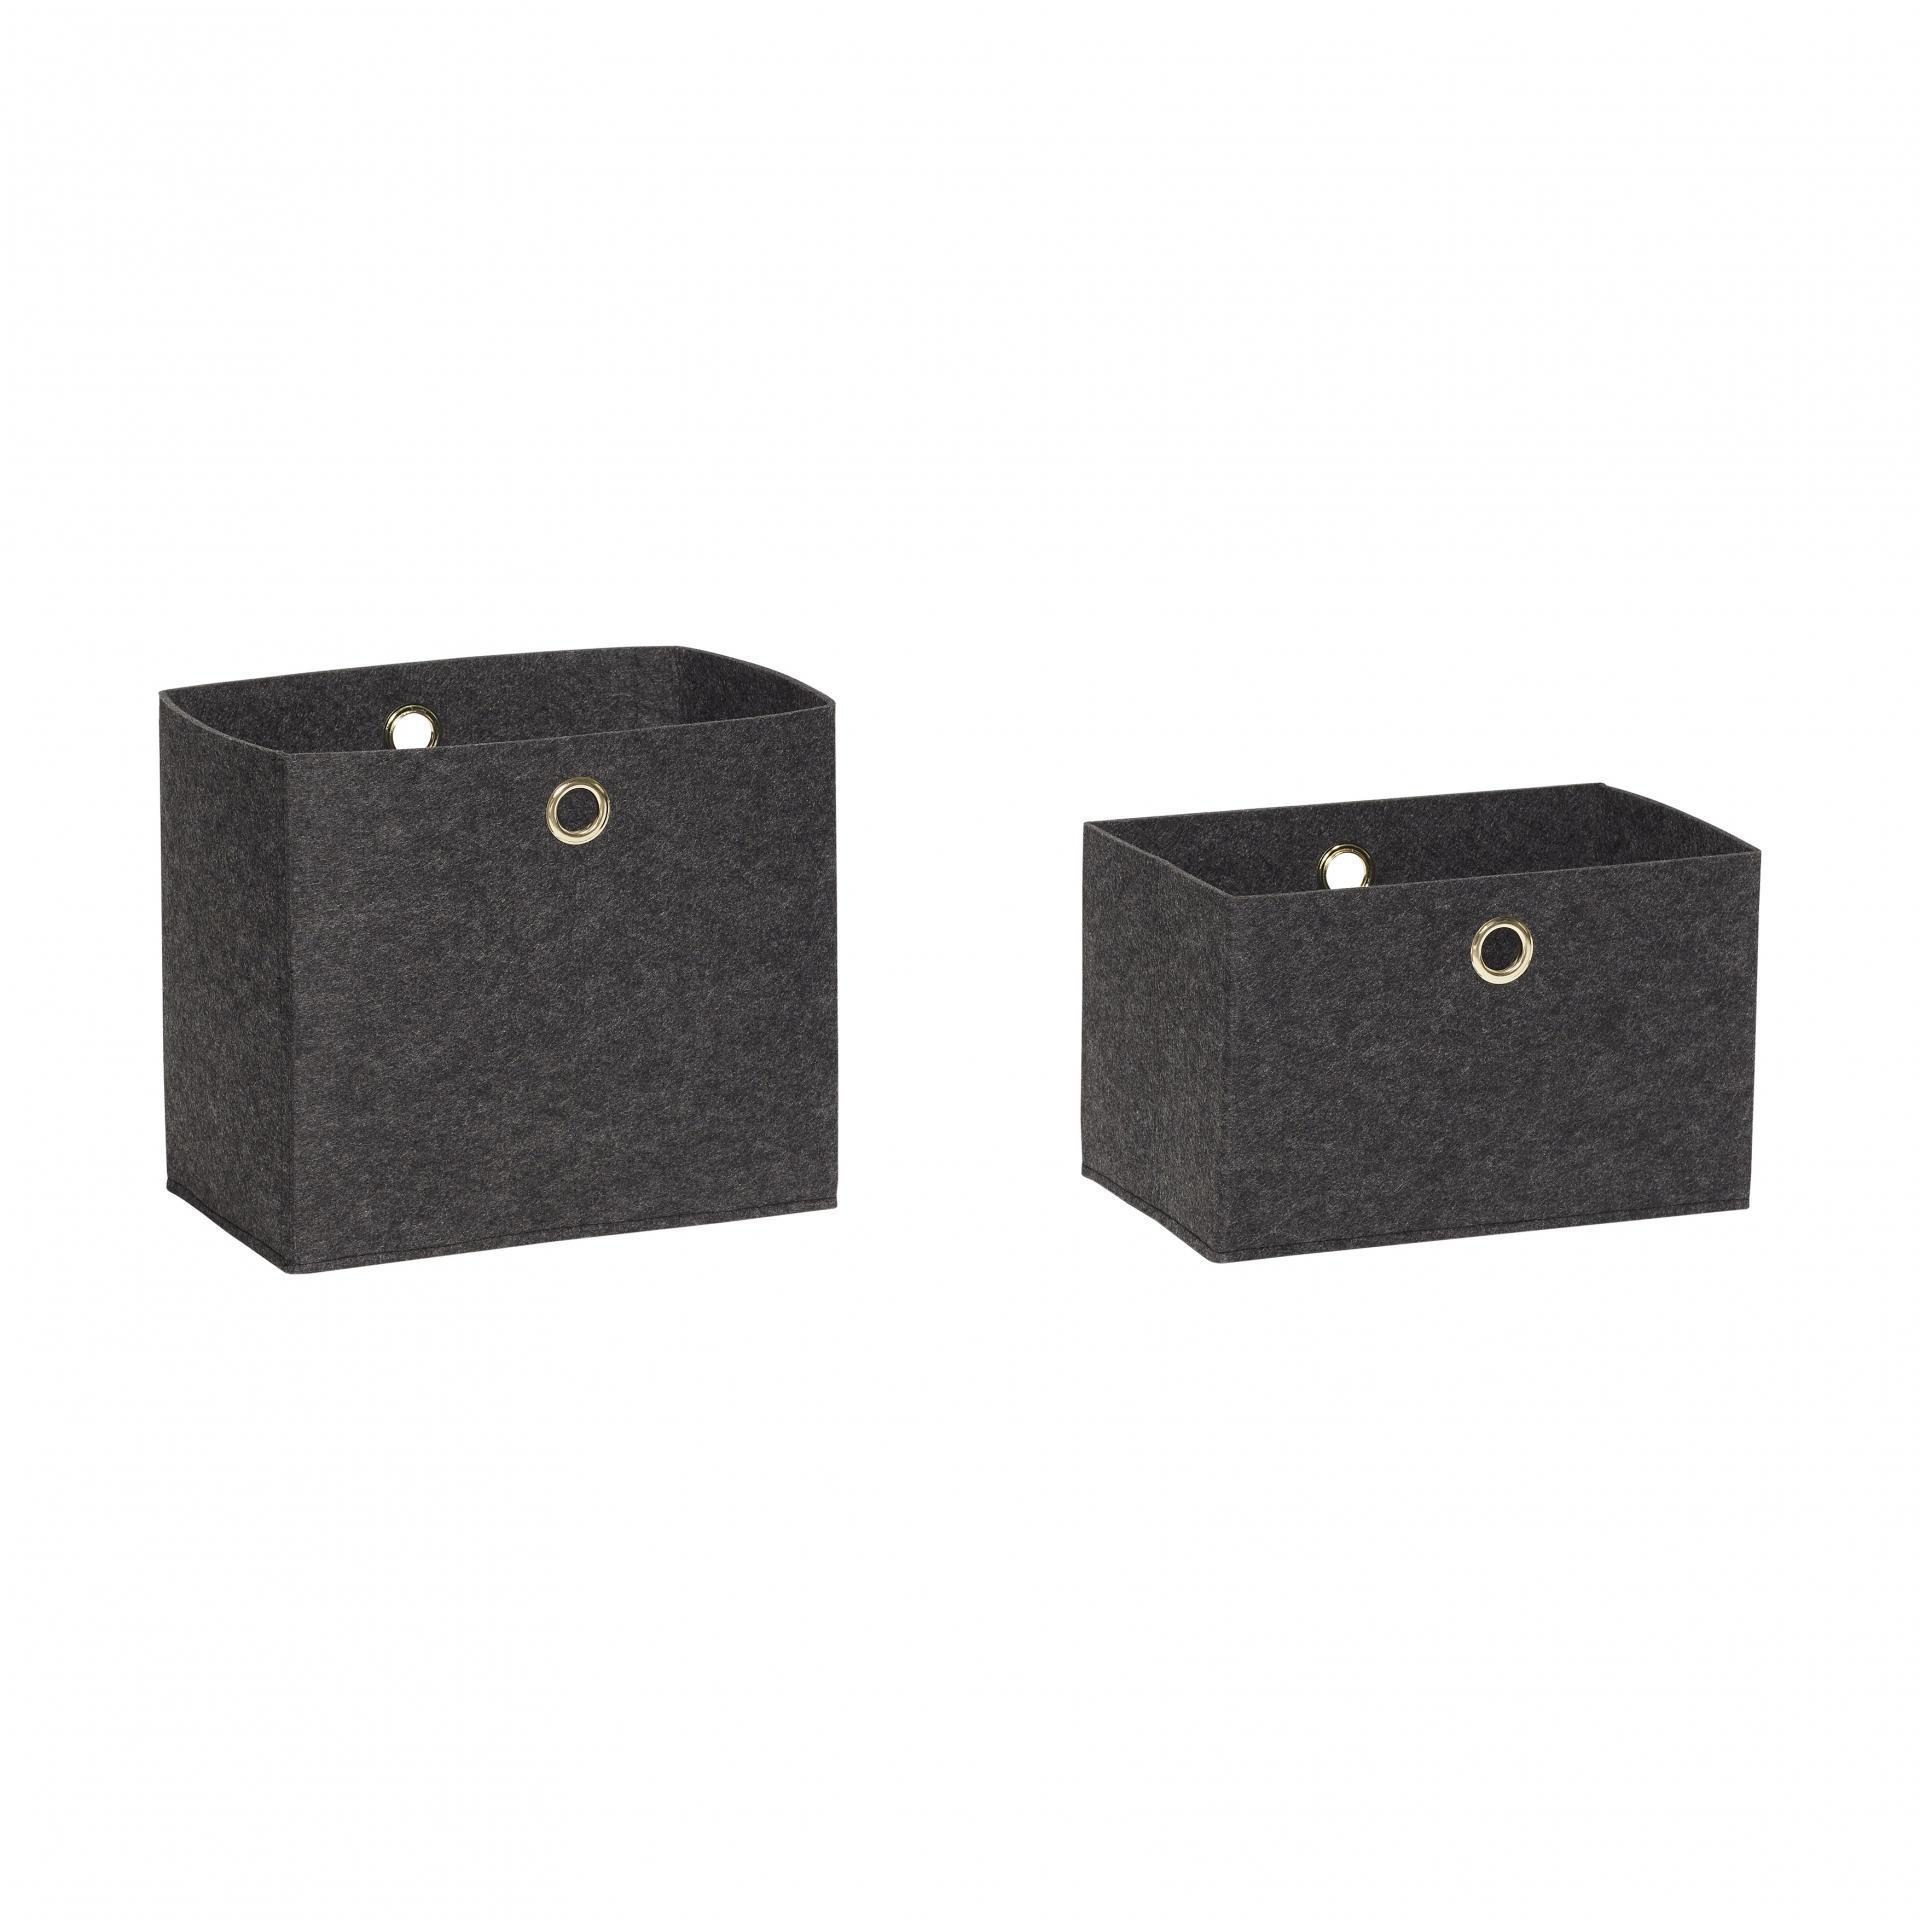 d7ec9a7da Hübsch Úložný box Felt Dark Grey Větší, šedá barva, textil